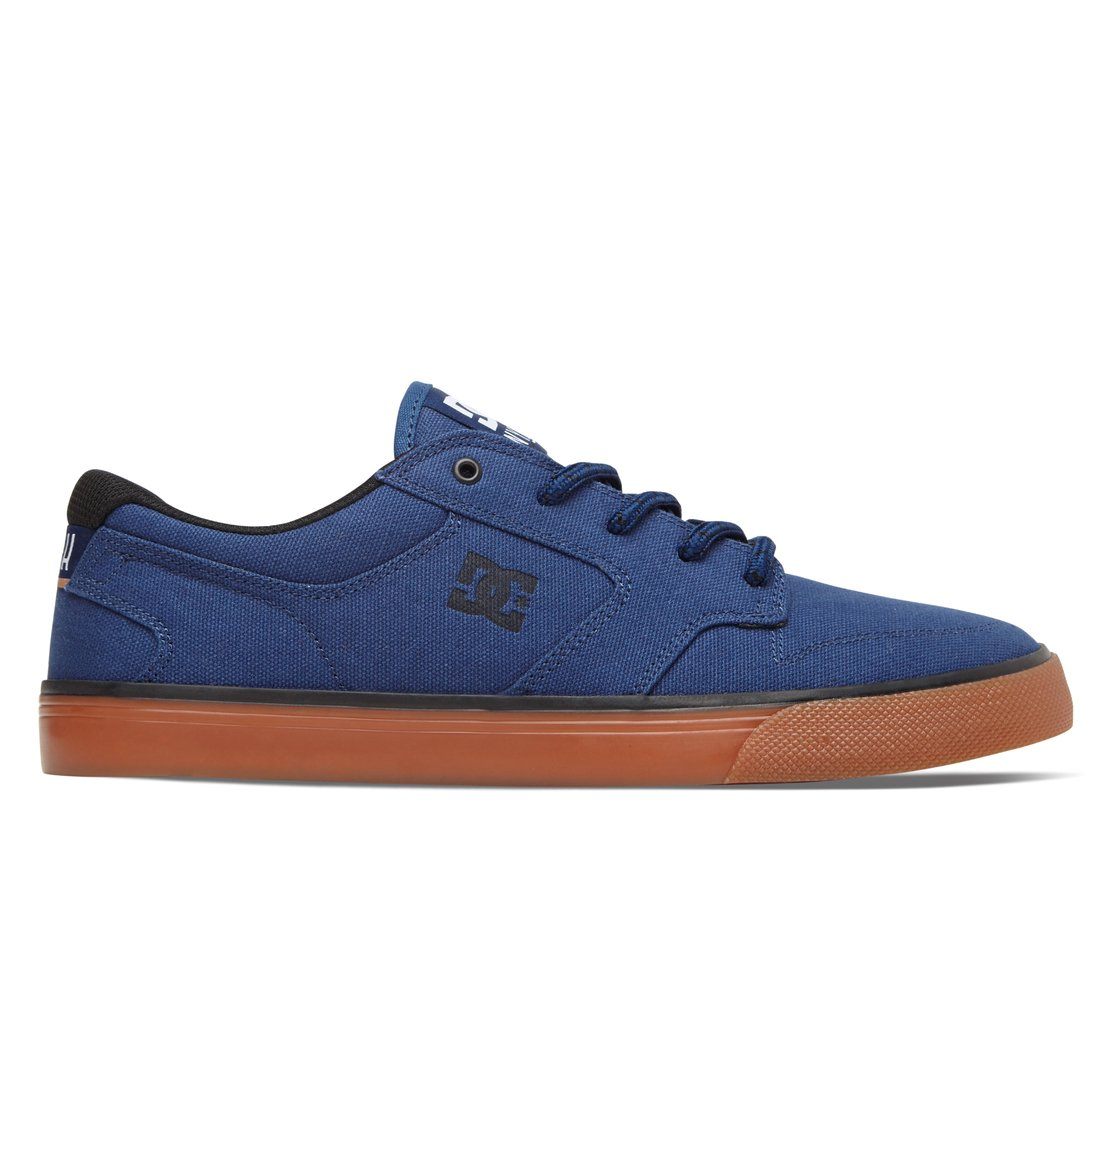 DC Shoes Council TX - Zapatillas bajas - niño - EU 36 FS7uwkn